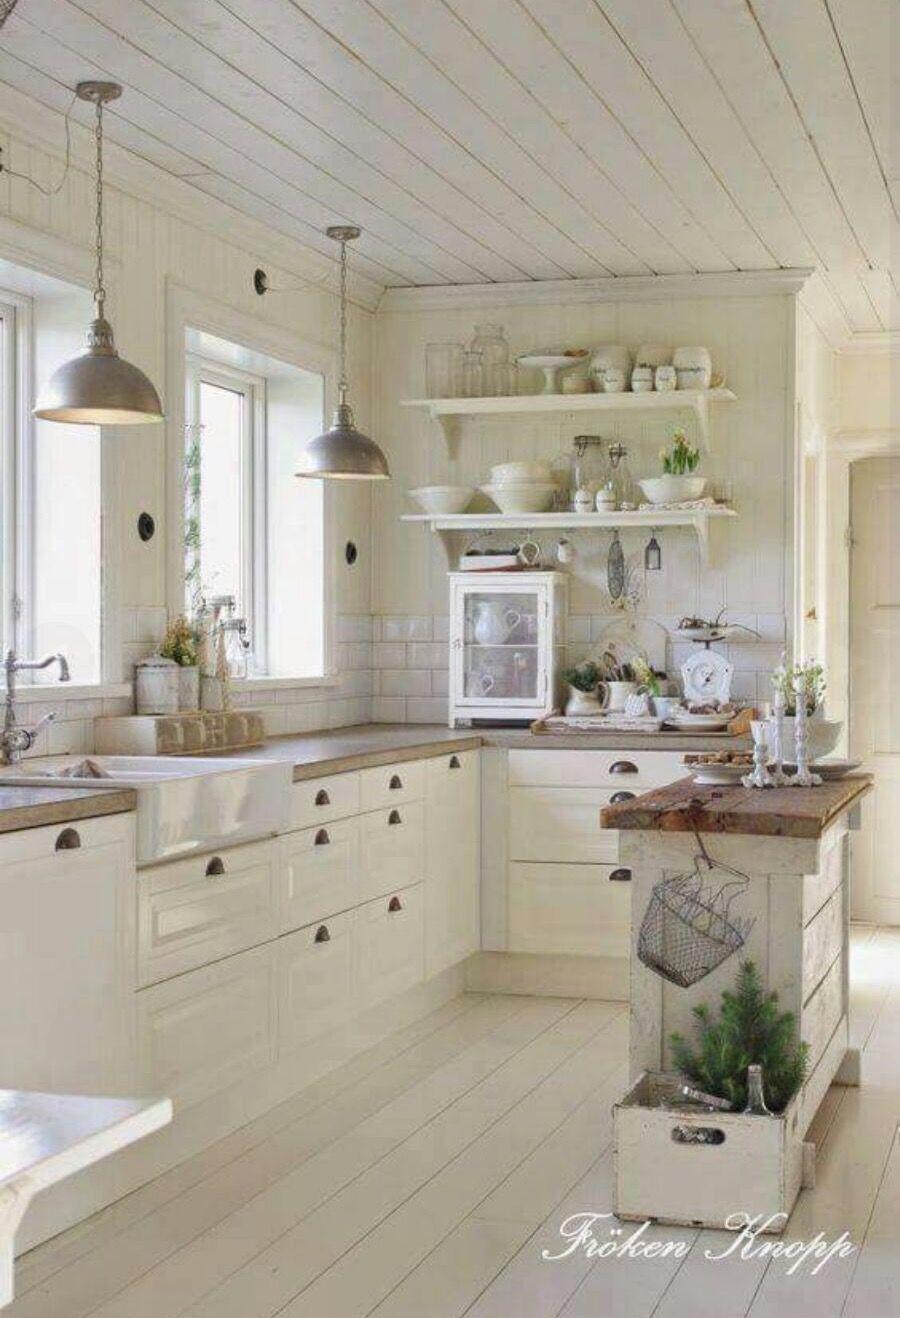 Pin de Anne Knowlton en Kitchen | Pinterest | Cocina pequeña ...